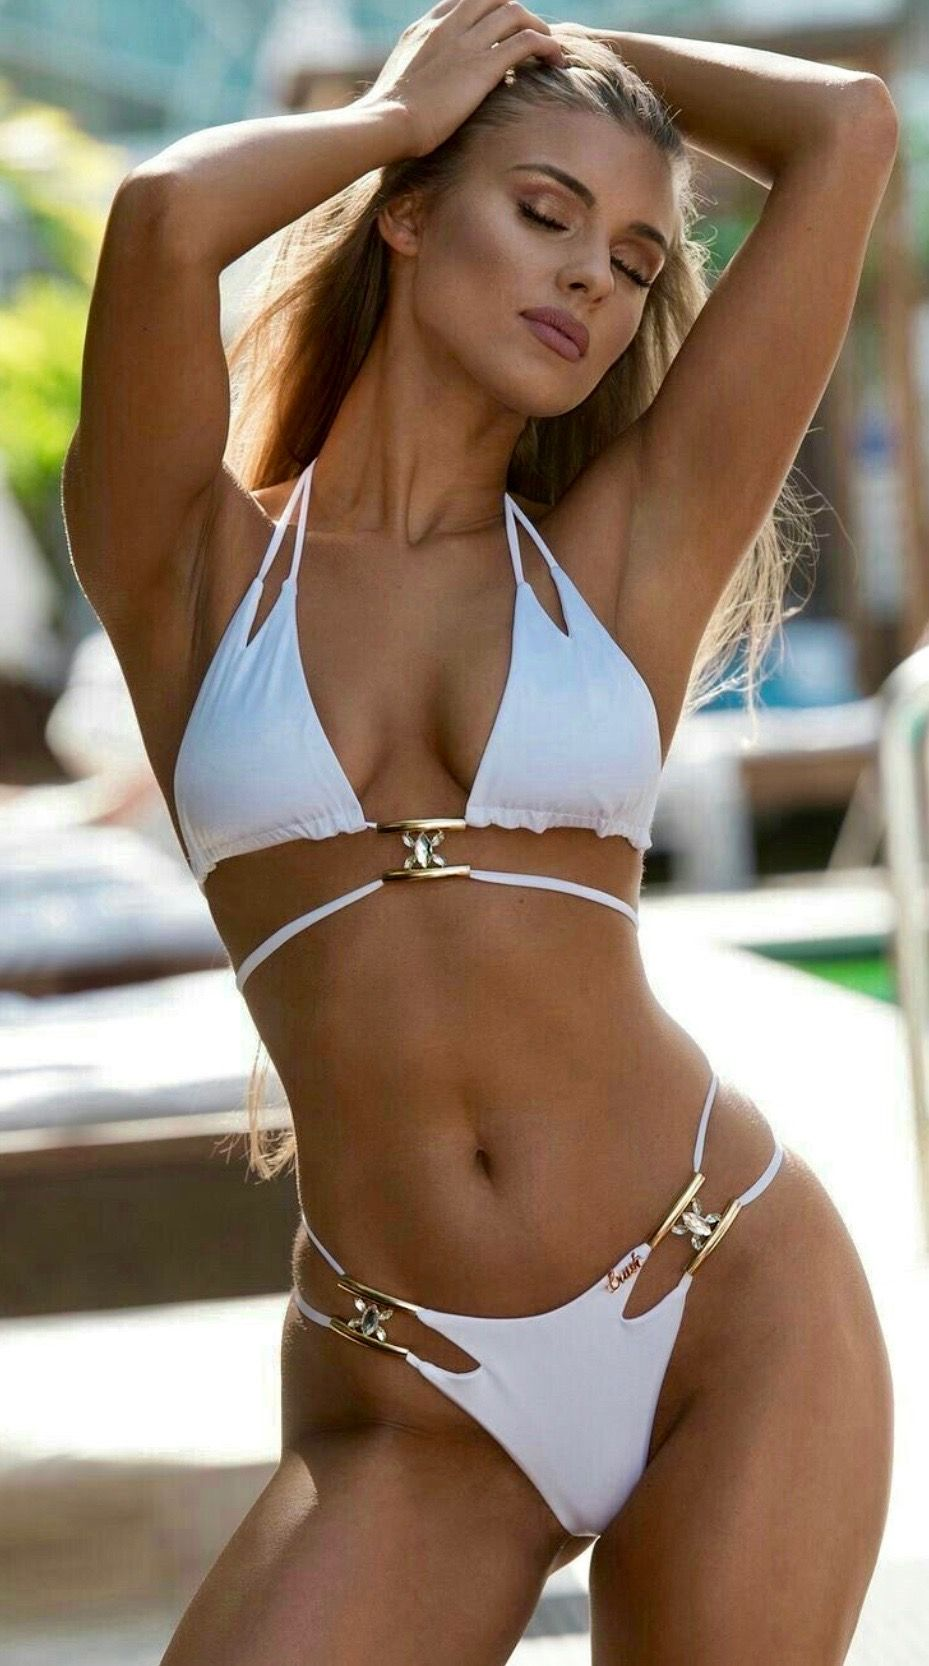 12aa2ef32d77 Bikini Bianchi, Bikini Estivi, Costume Da Bagno Bikini, Bikini Sexy, Bikini  Spiaggia